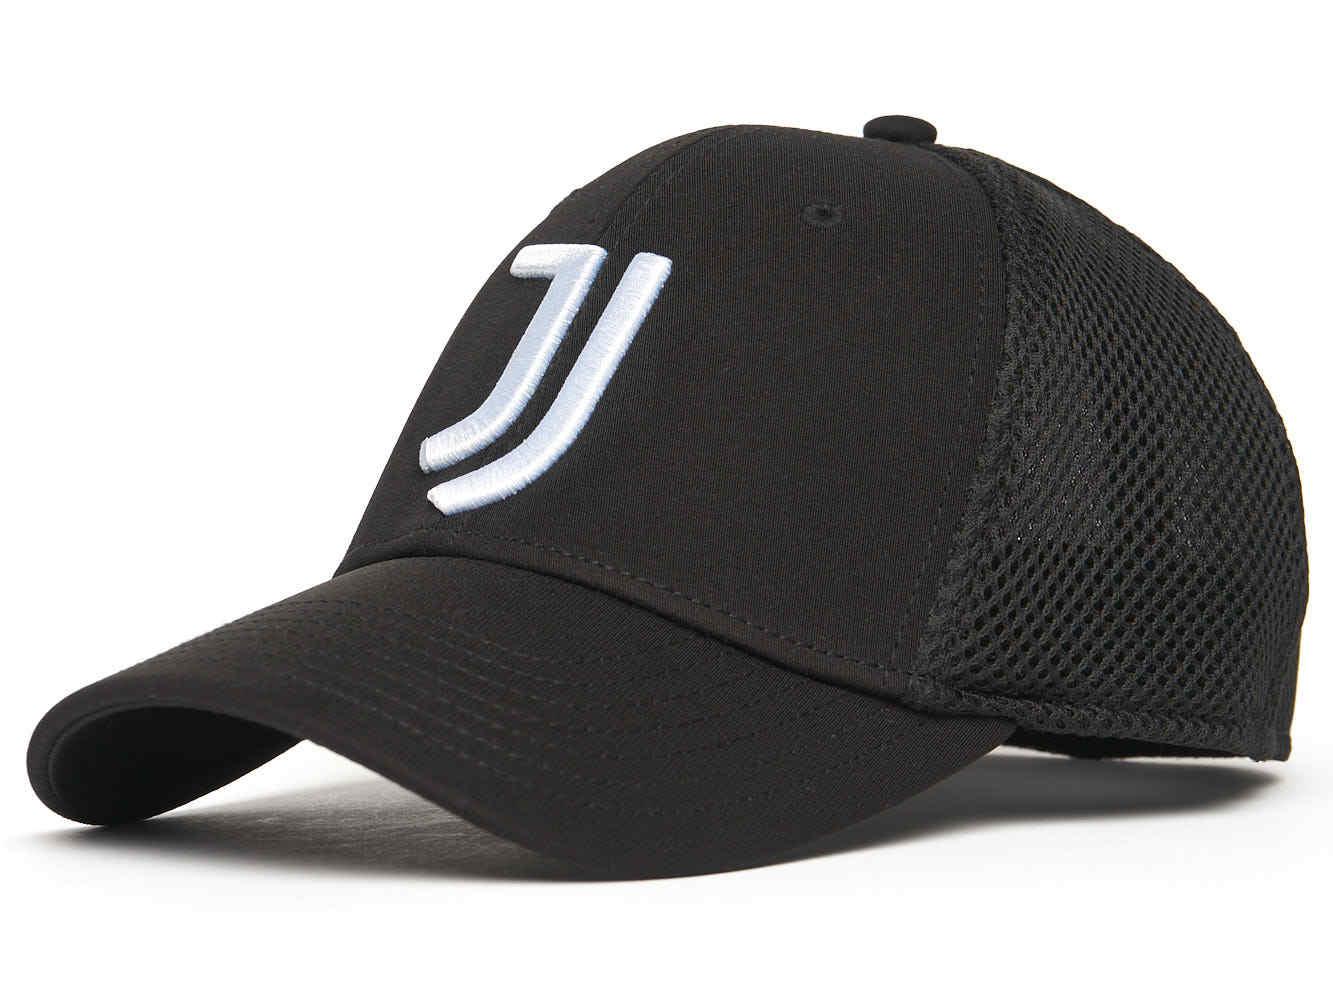 Бейсболка Ювентус № 10 (размер XL/XXL)